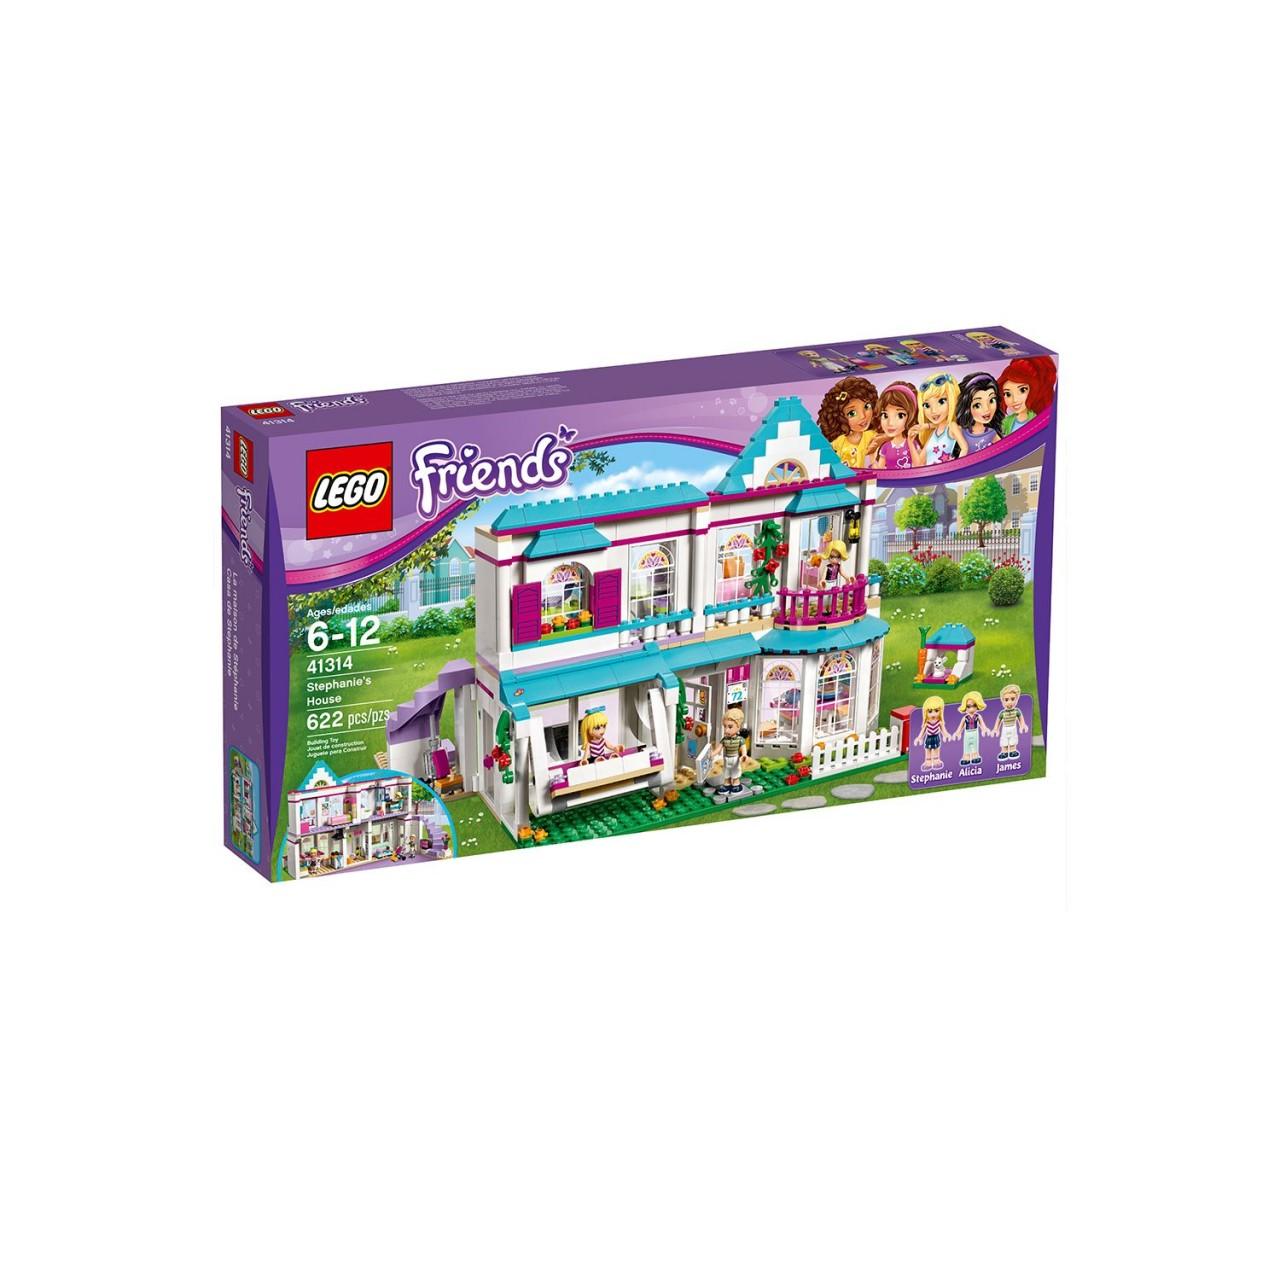 LEGO FRIENDS 41314 Stephanies Haus